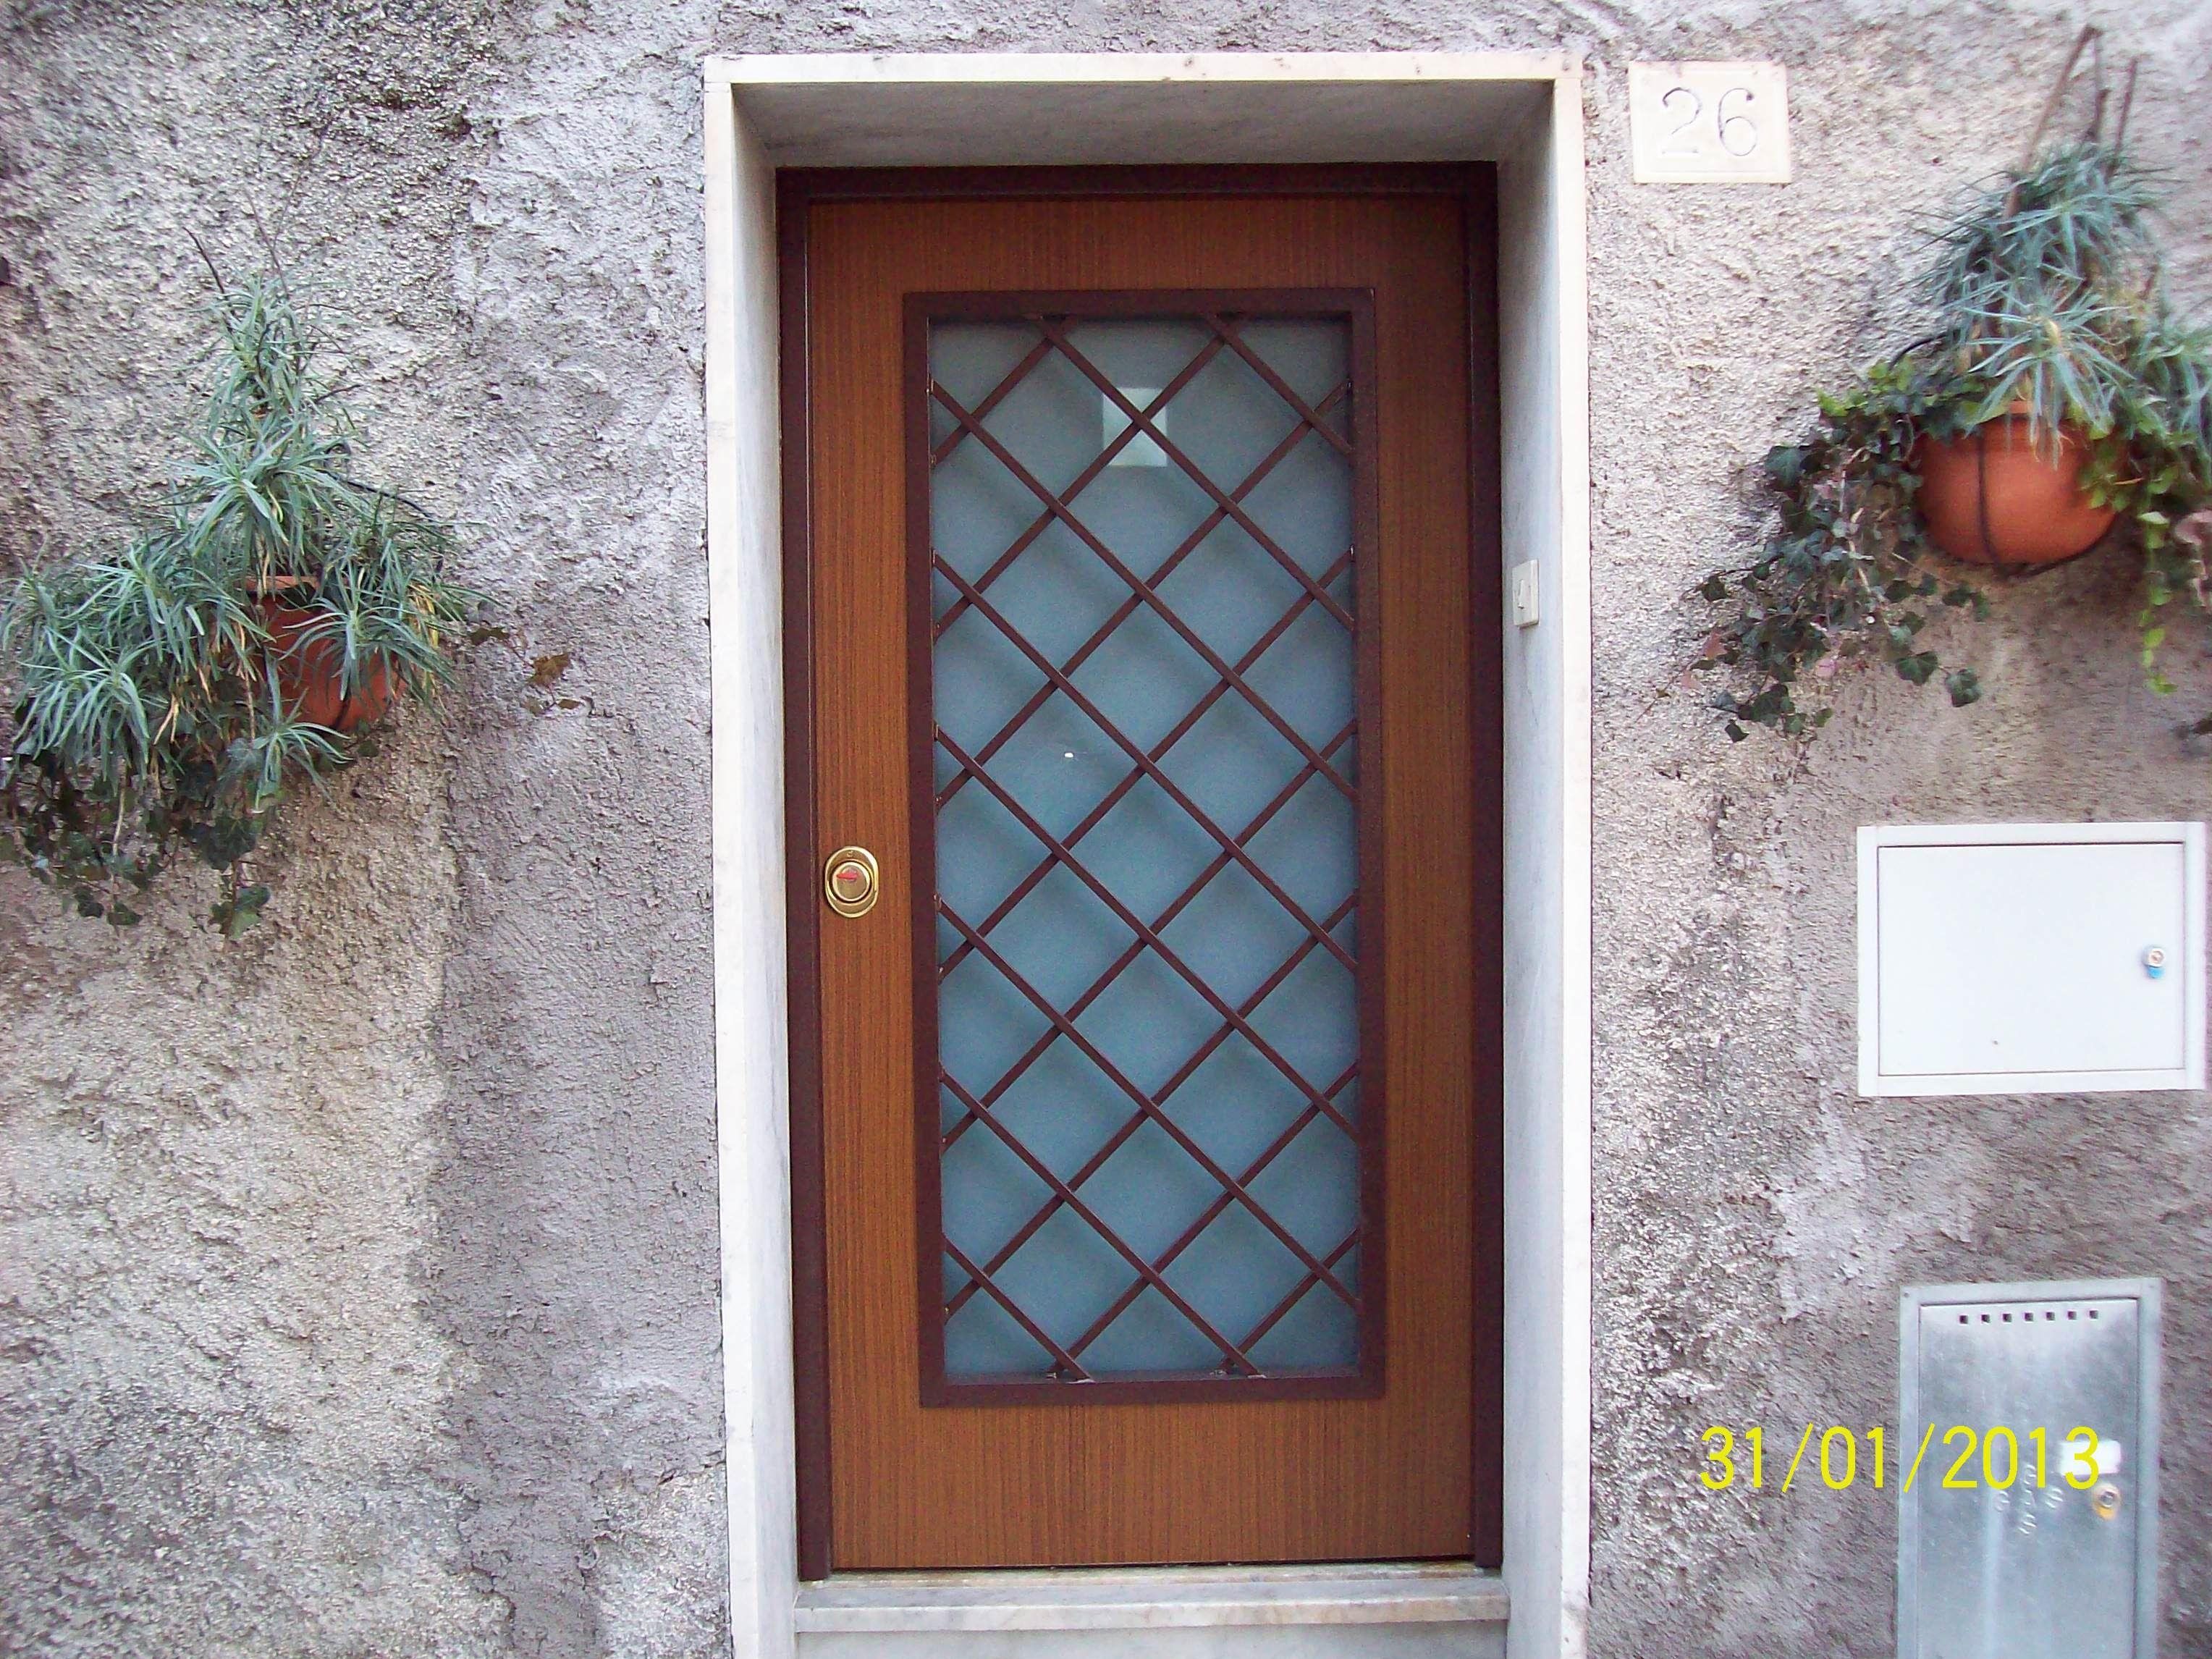 Porta blindata vista esterna con vetro visarm